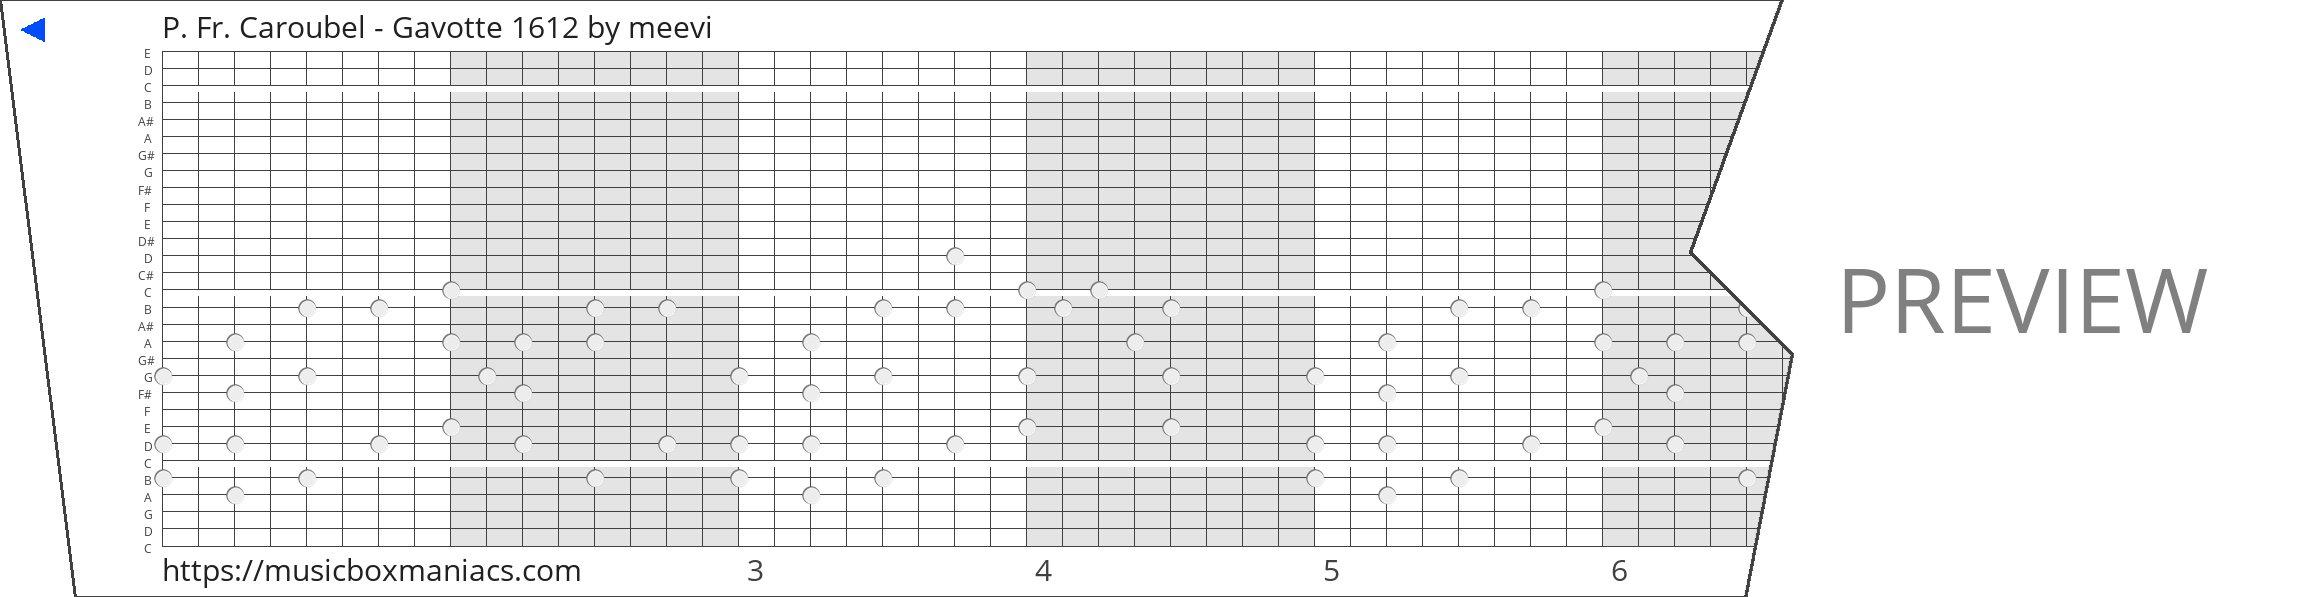 P. Fr. Caroubel - Gavotte 1612 30 note music box paper strip